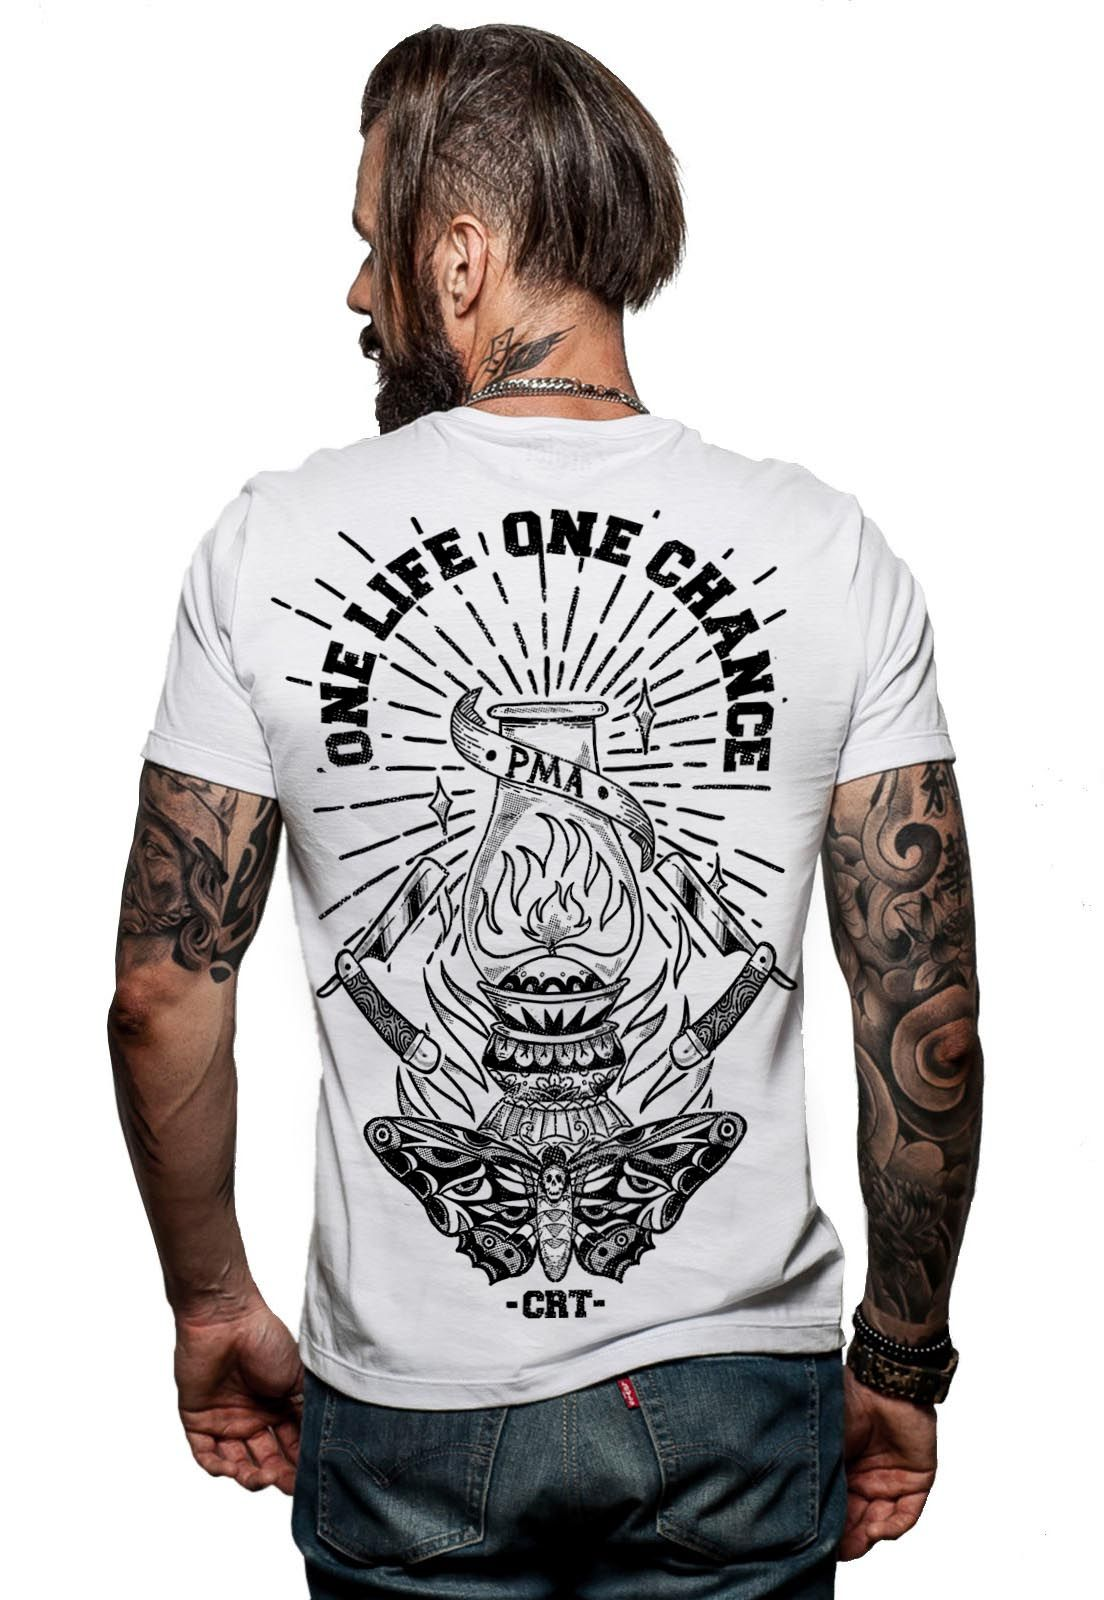 c5766f0eb8169 camisetas] [masculinas] [caráter] [vistacarater] [comprar camisetas ...